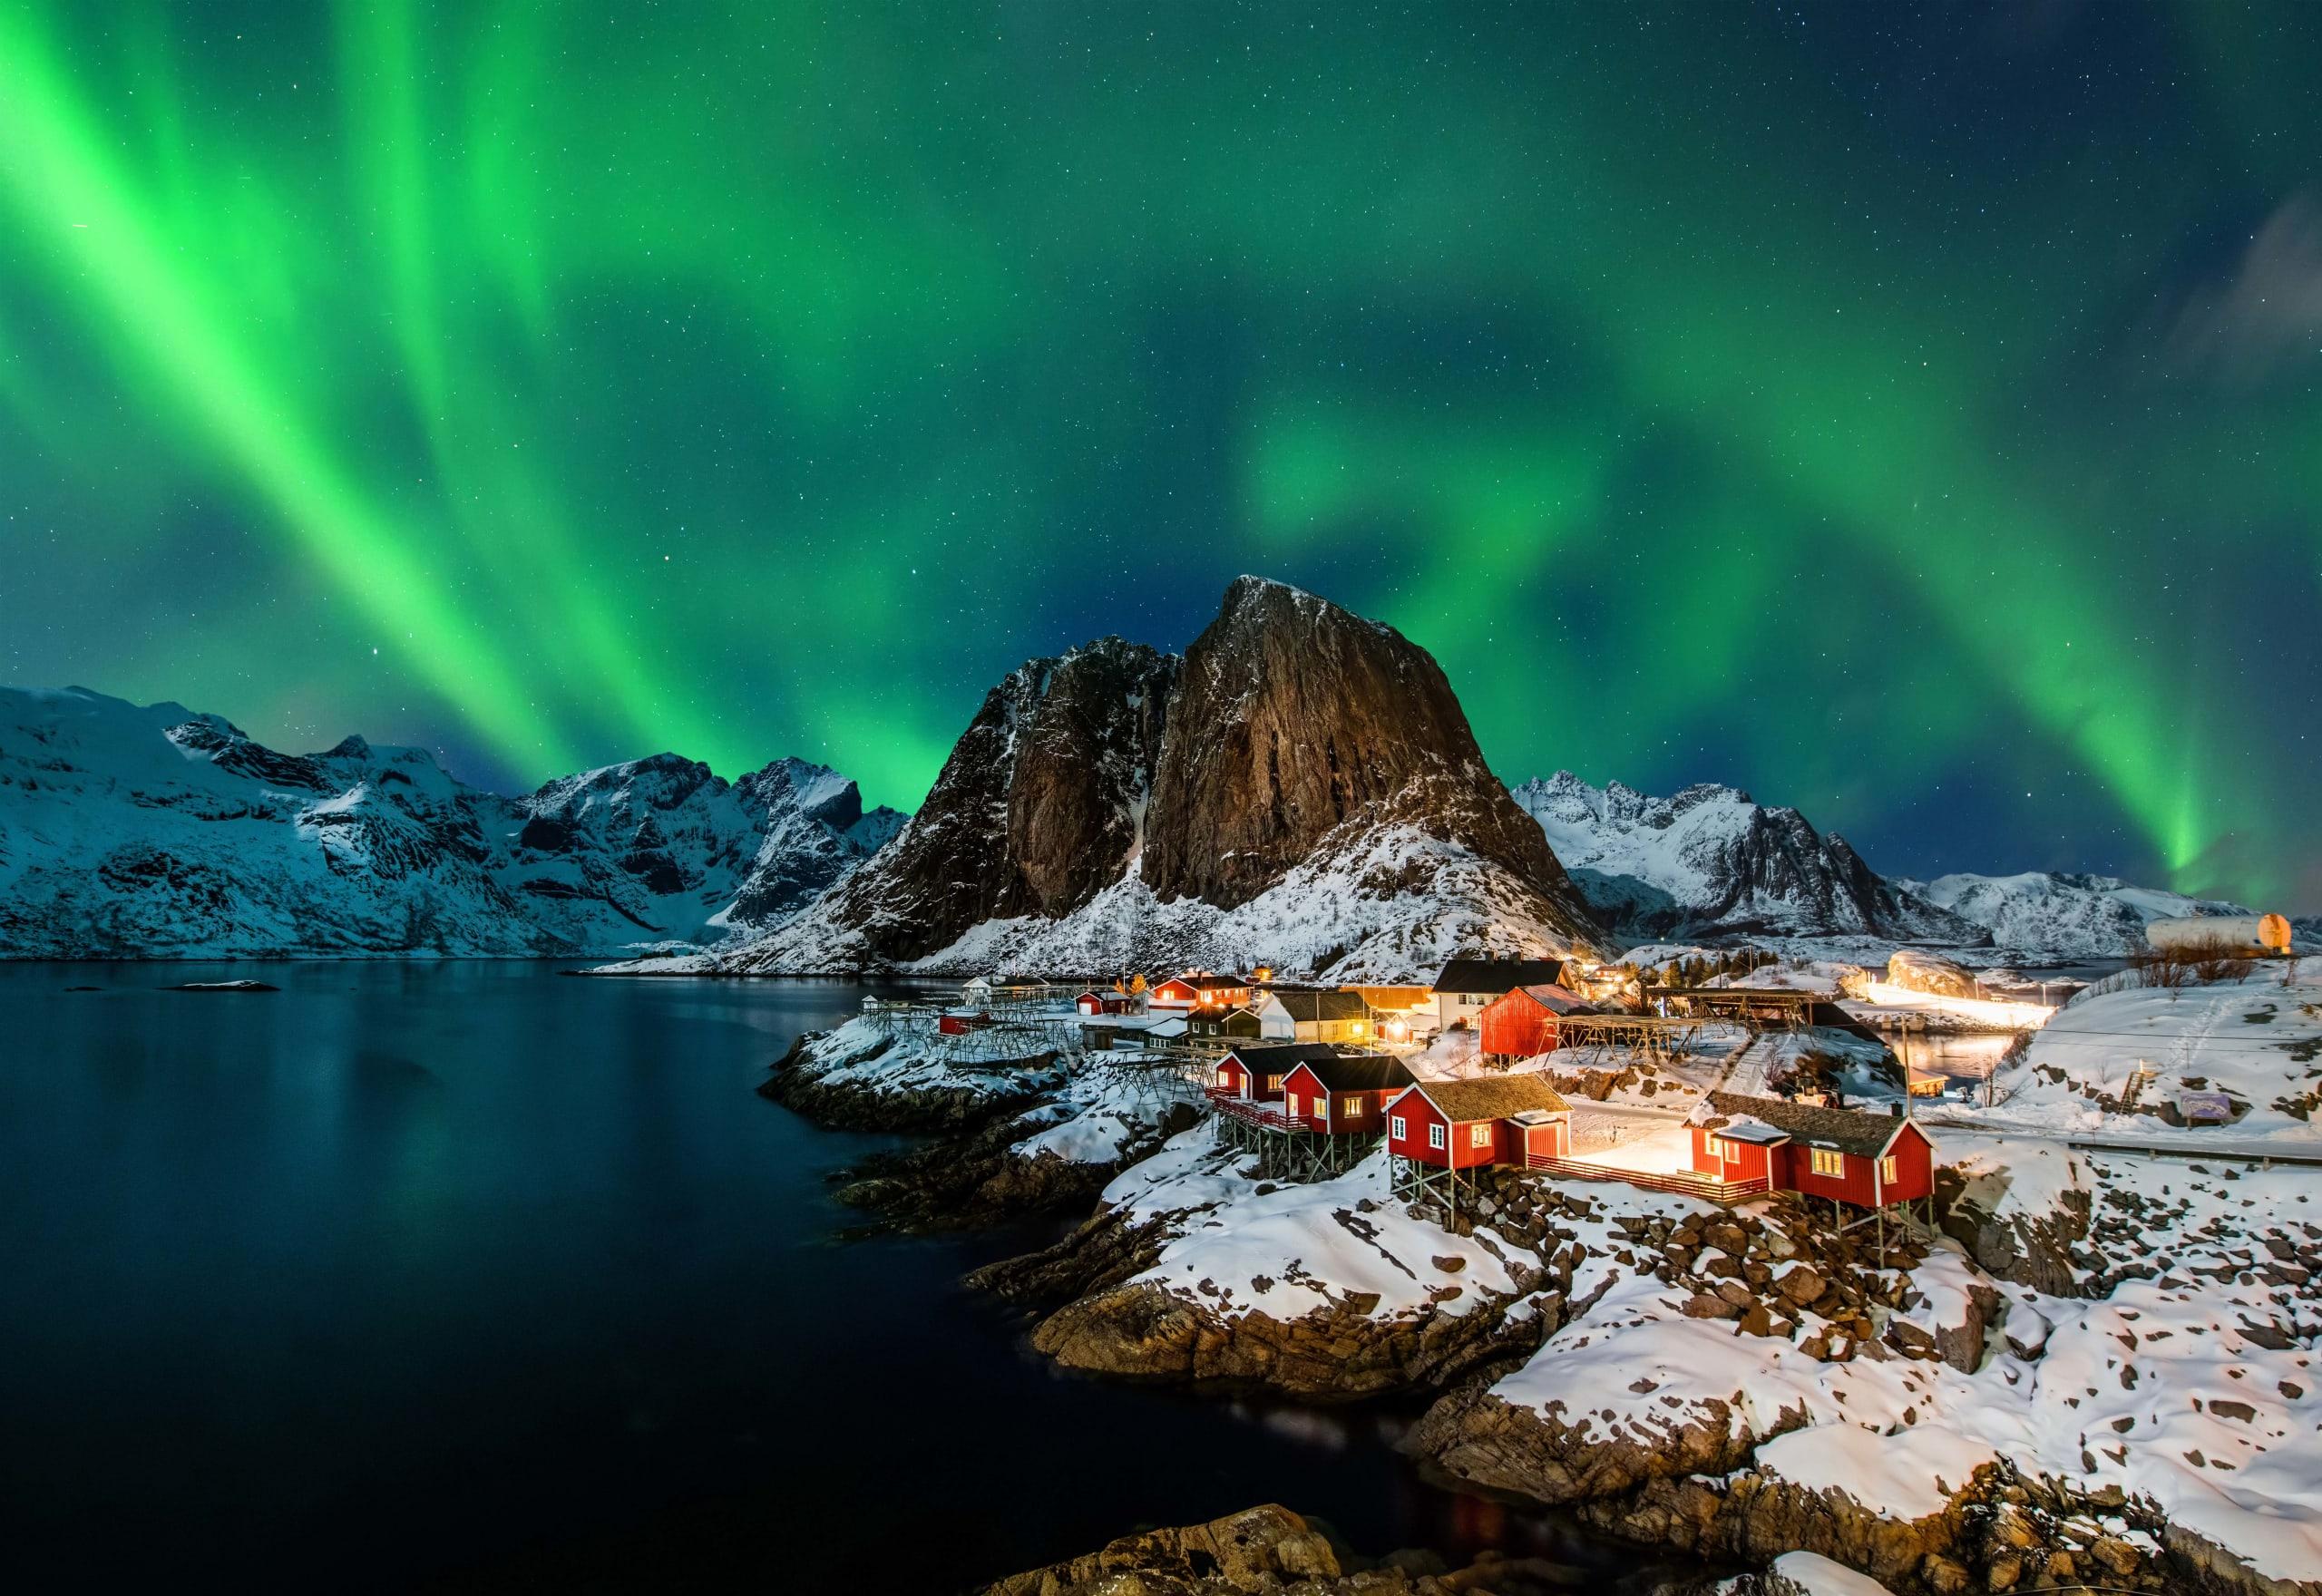 Aurora Borealis dancing on the night sky above Hamnøy in Lofoten